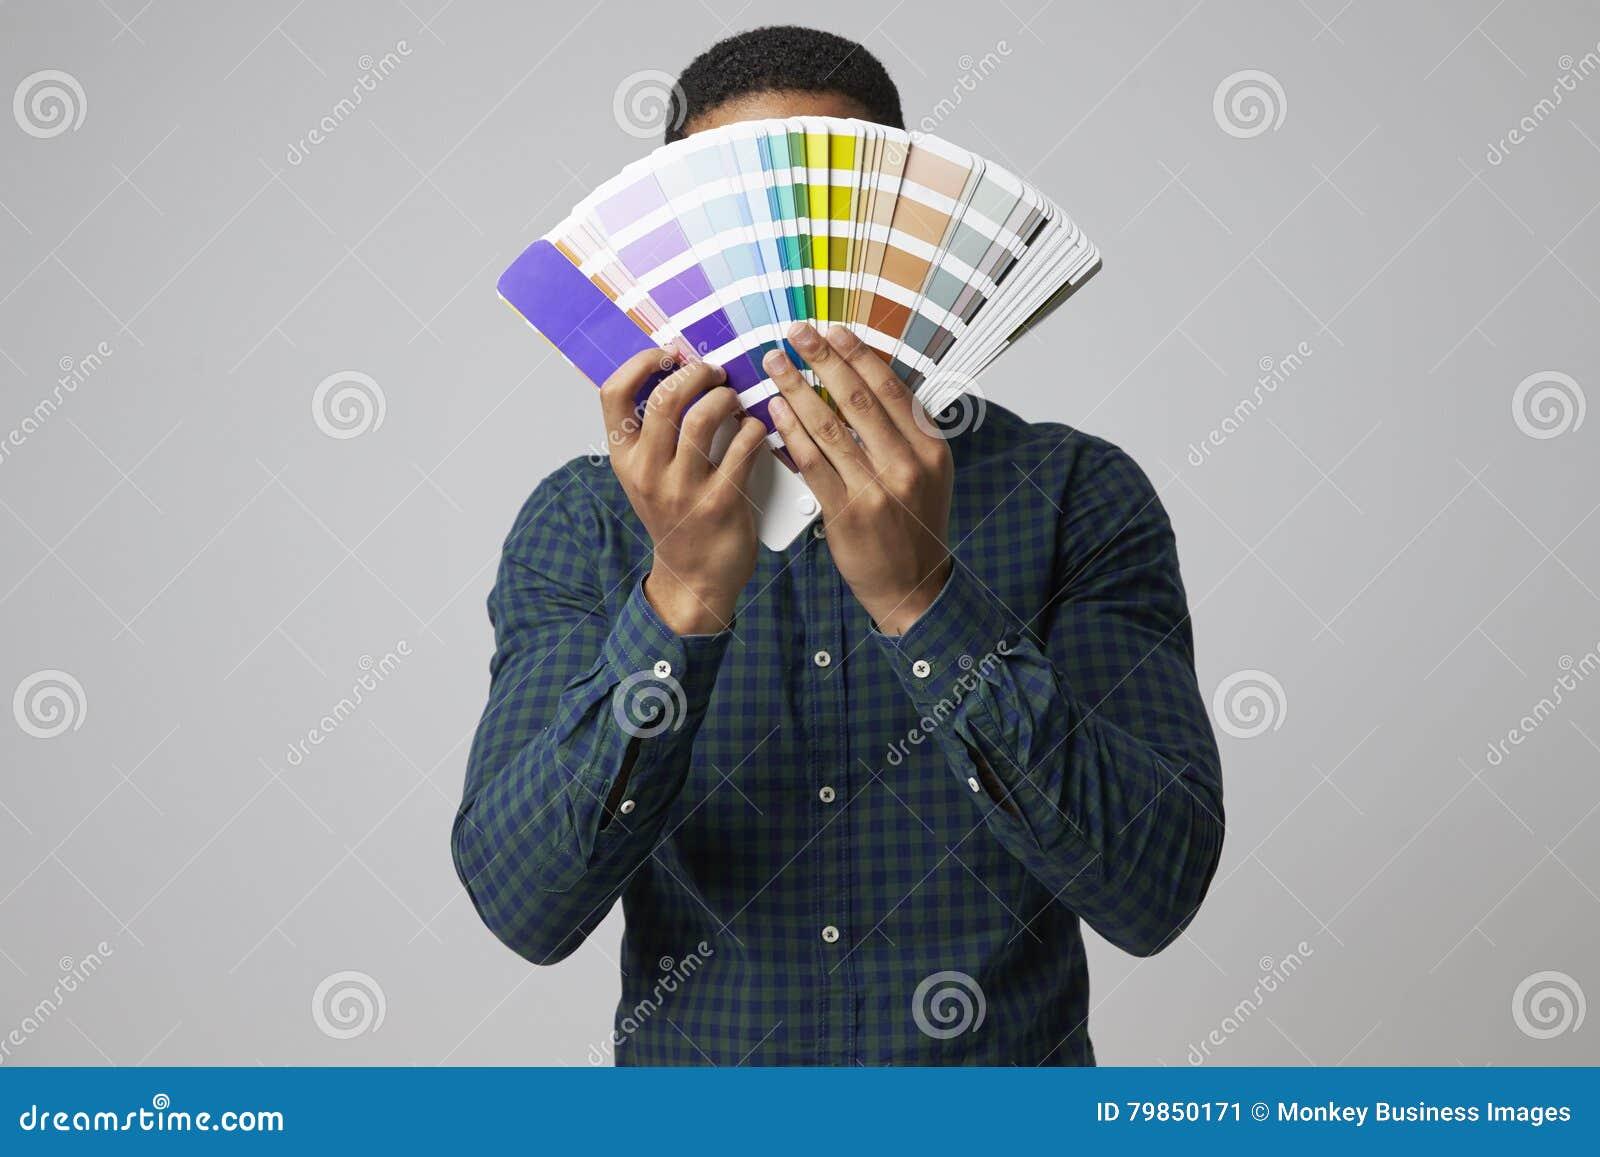 Studio Portrait Of Graphic Designer With Color Swatches